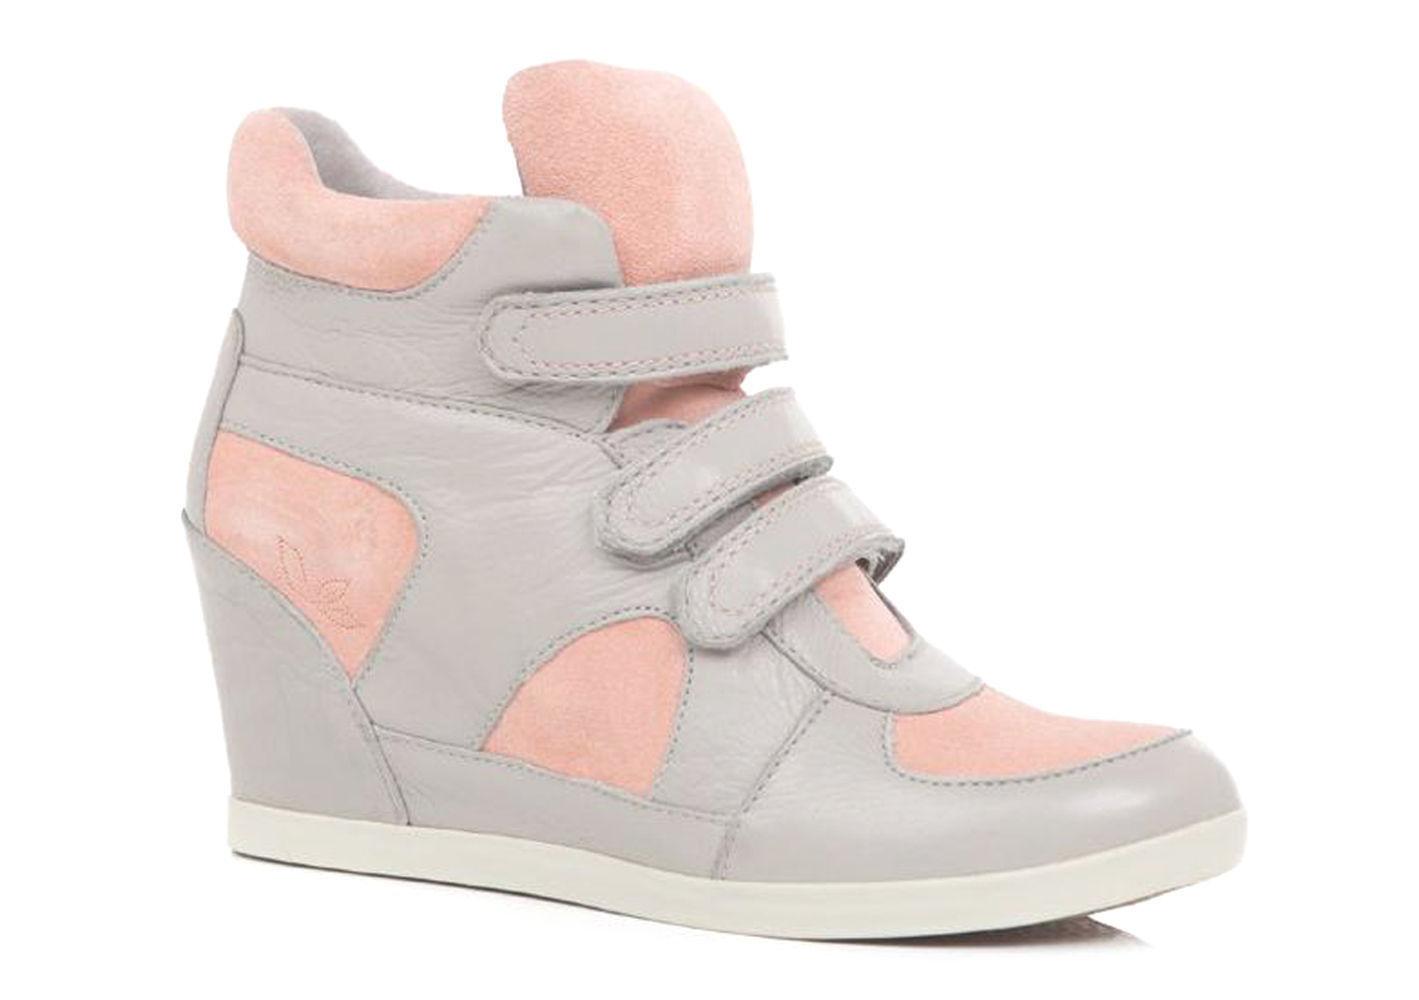 219 New Koolaburra  Preston II Luna Stone Leather Sneaker Wedge Boots sz US 6M